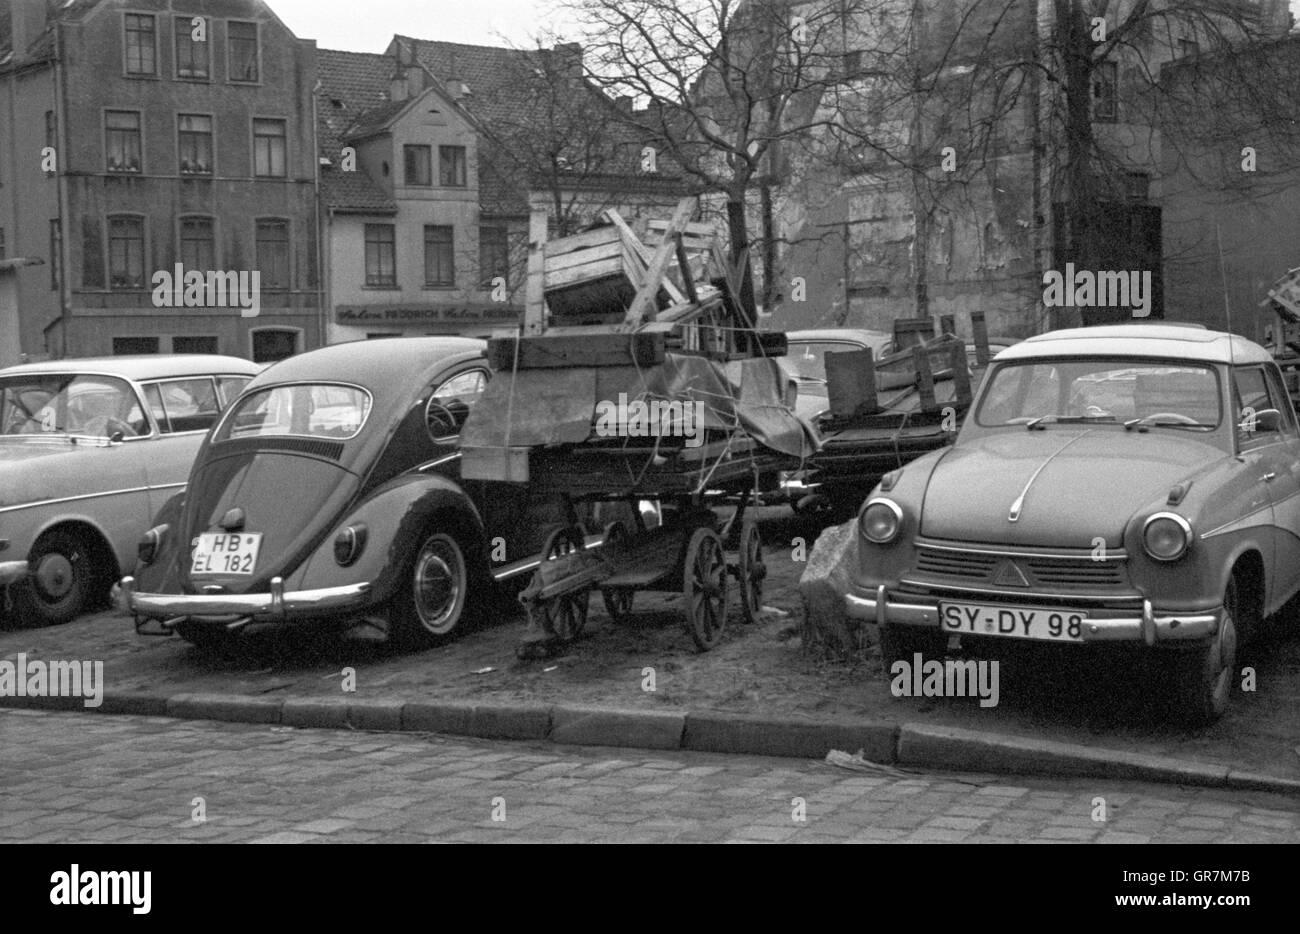 Bremen 1972 Bw - Stock Image